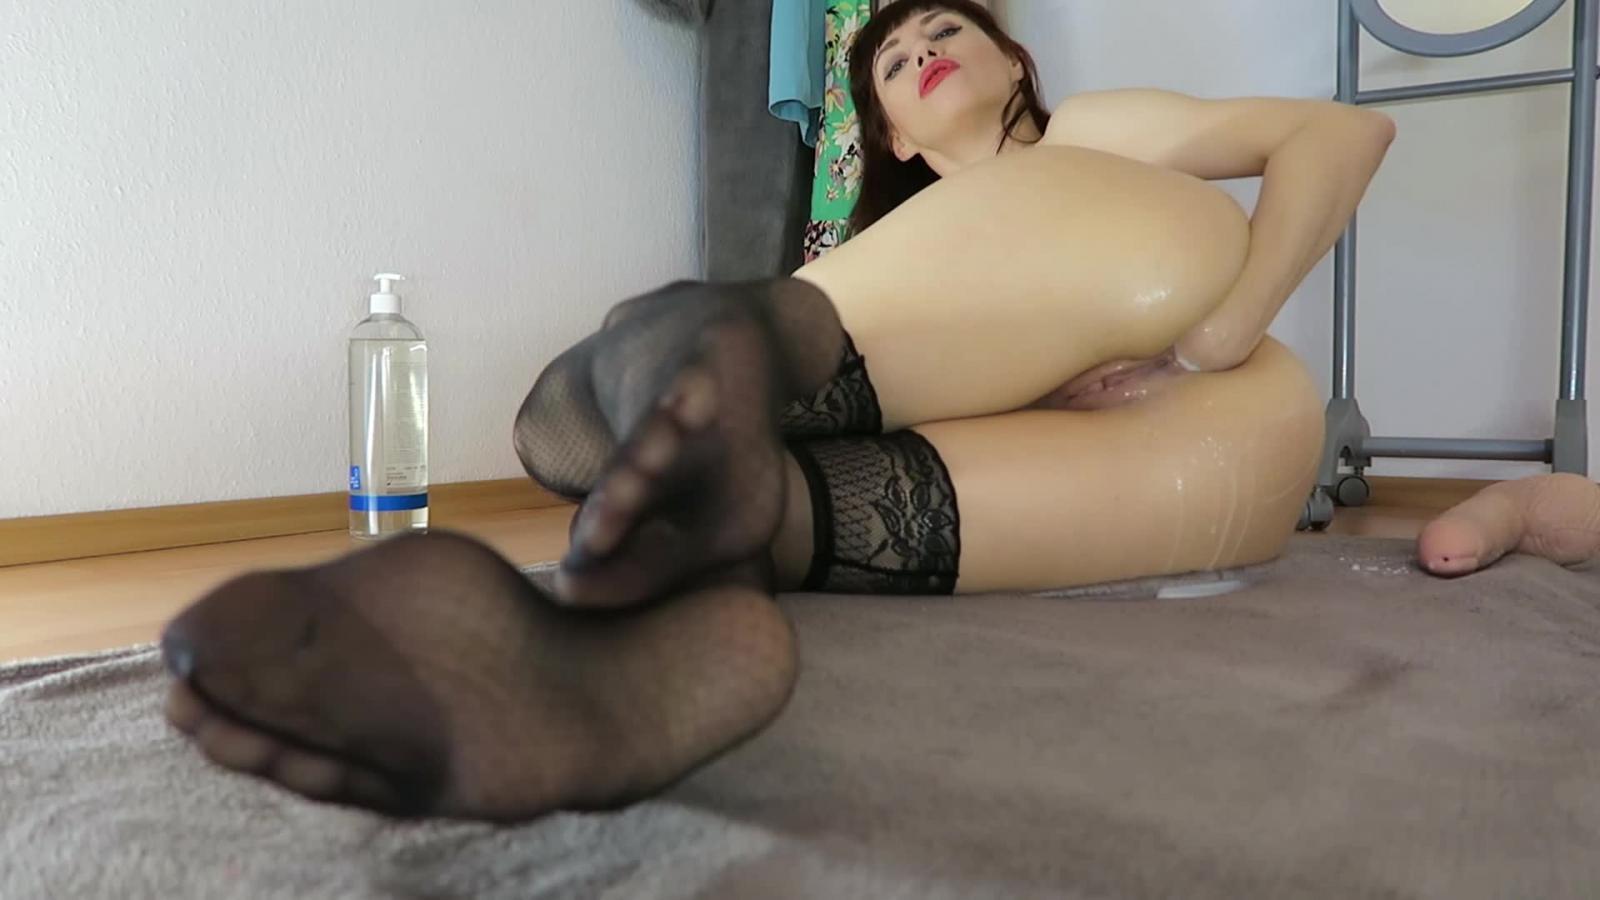 Mylene monroe stepsis porn pics